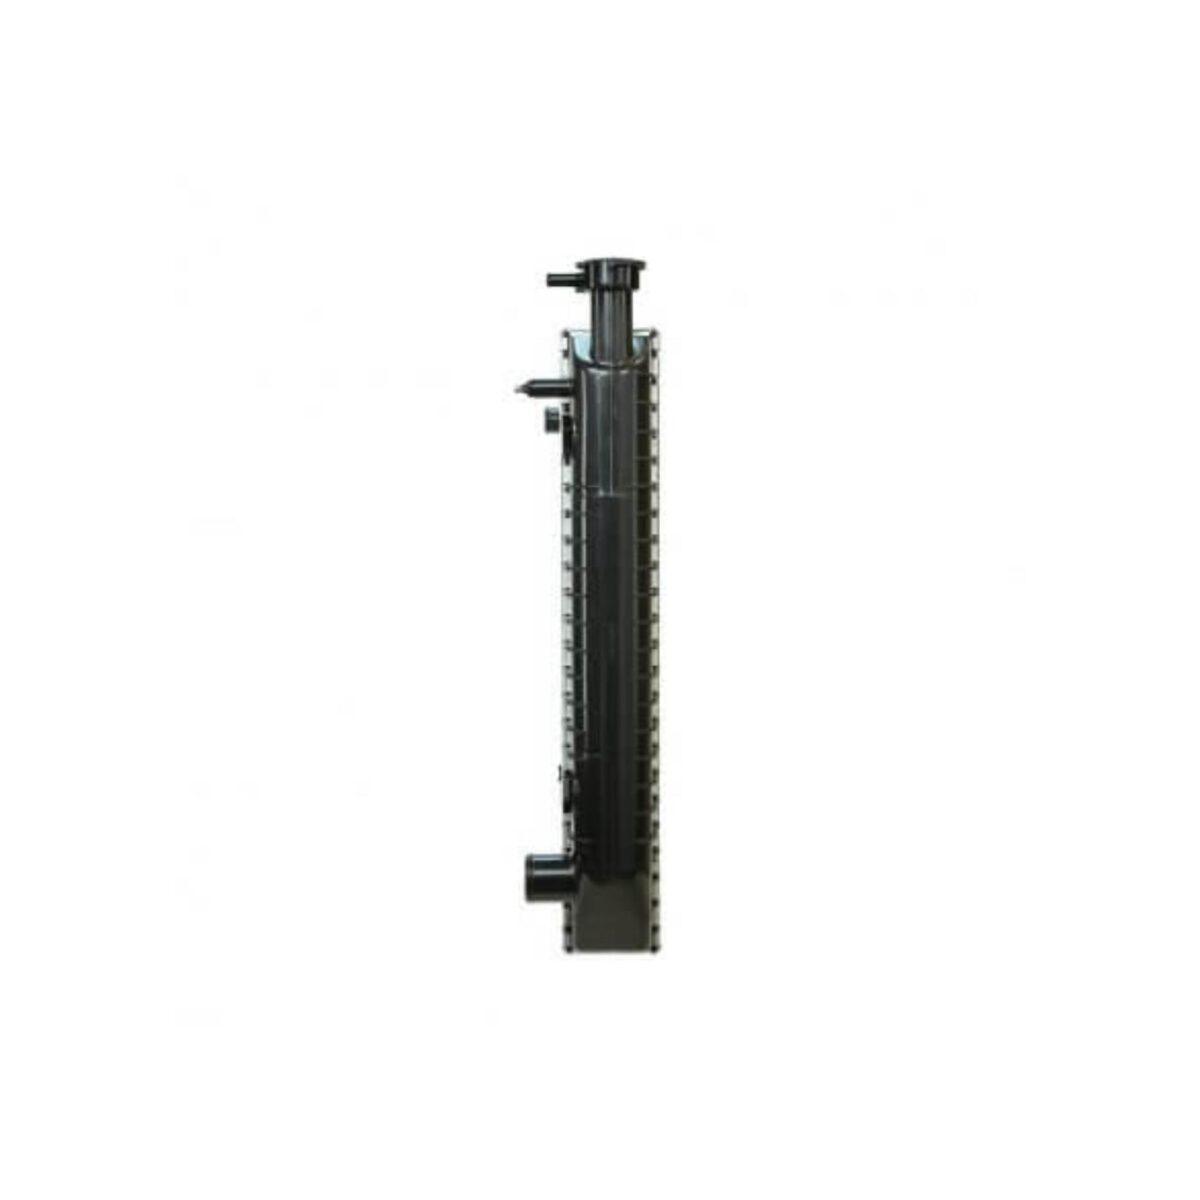 peterbilt 379 base l6 14.6l ac condenser oem f316064 2